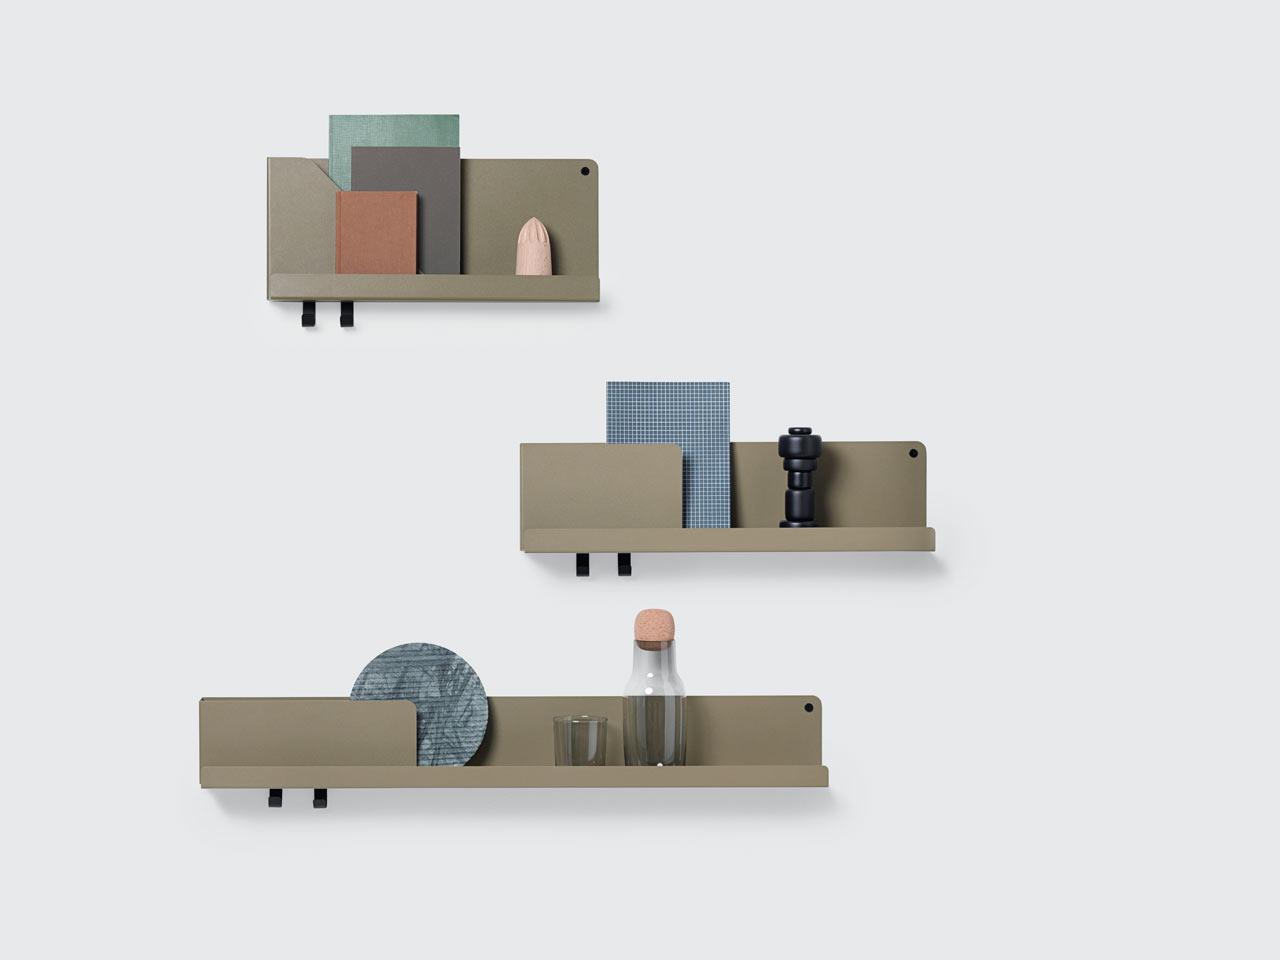 Folded-Shelf-Muuto-Johan-van-Hengel-3